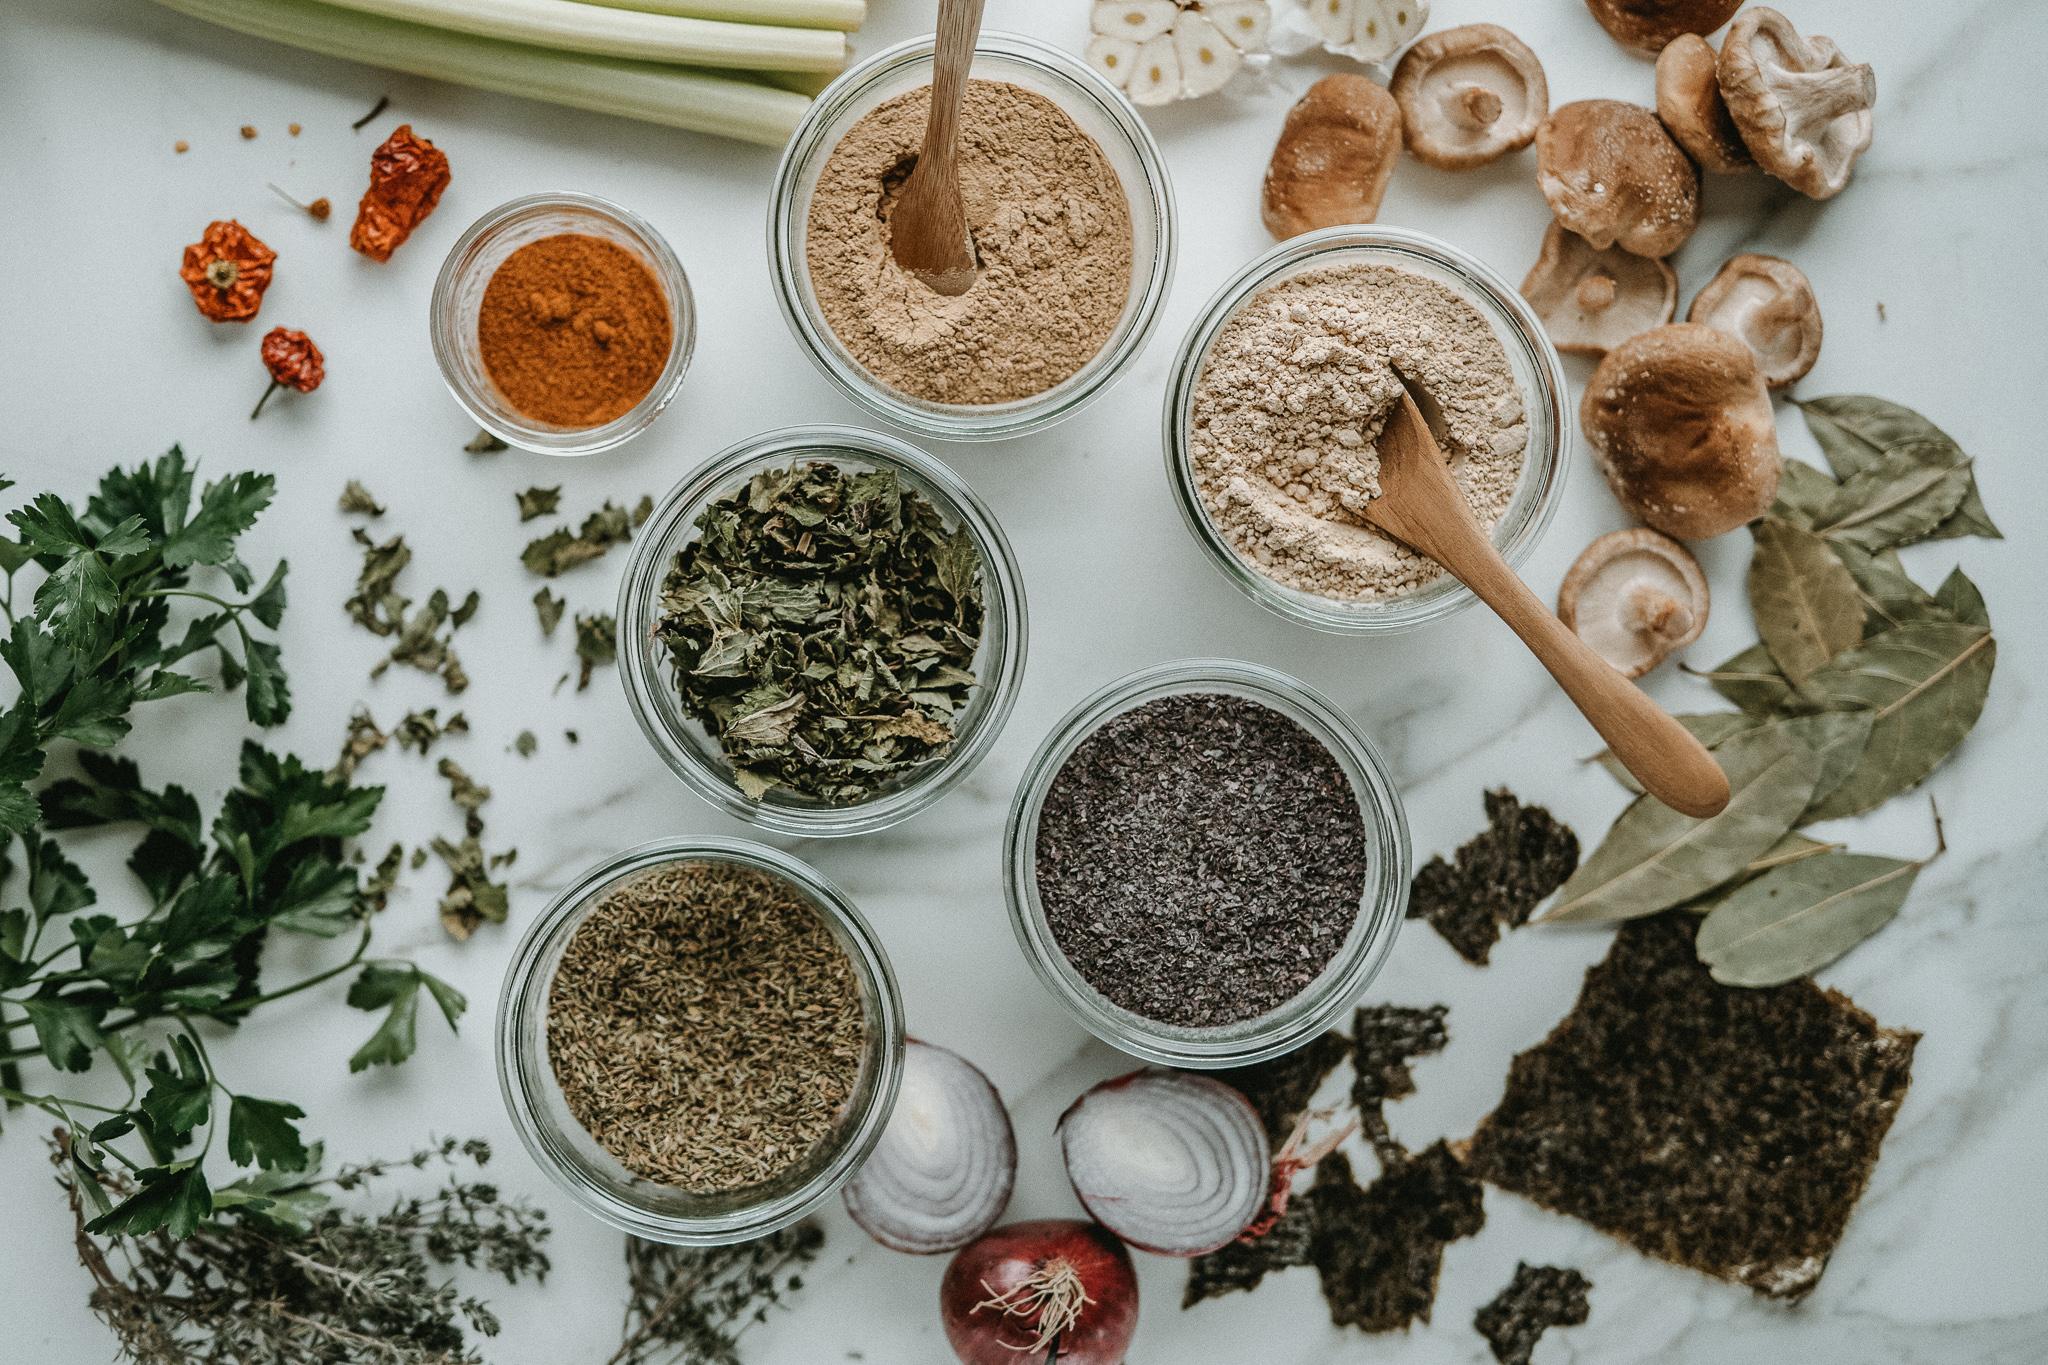 Cooking with herbs - nourishing herbal soup seasoning mix